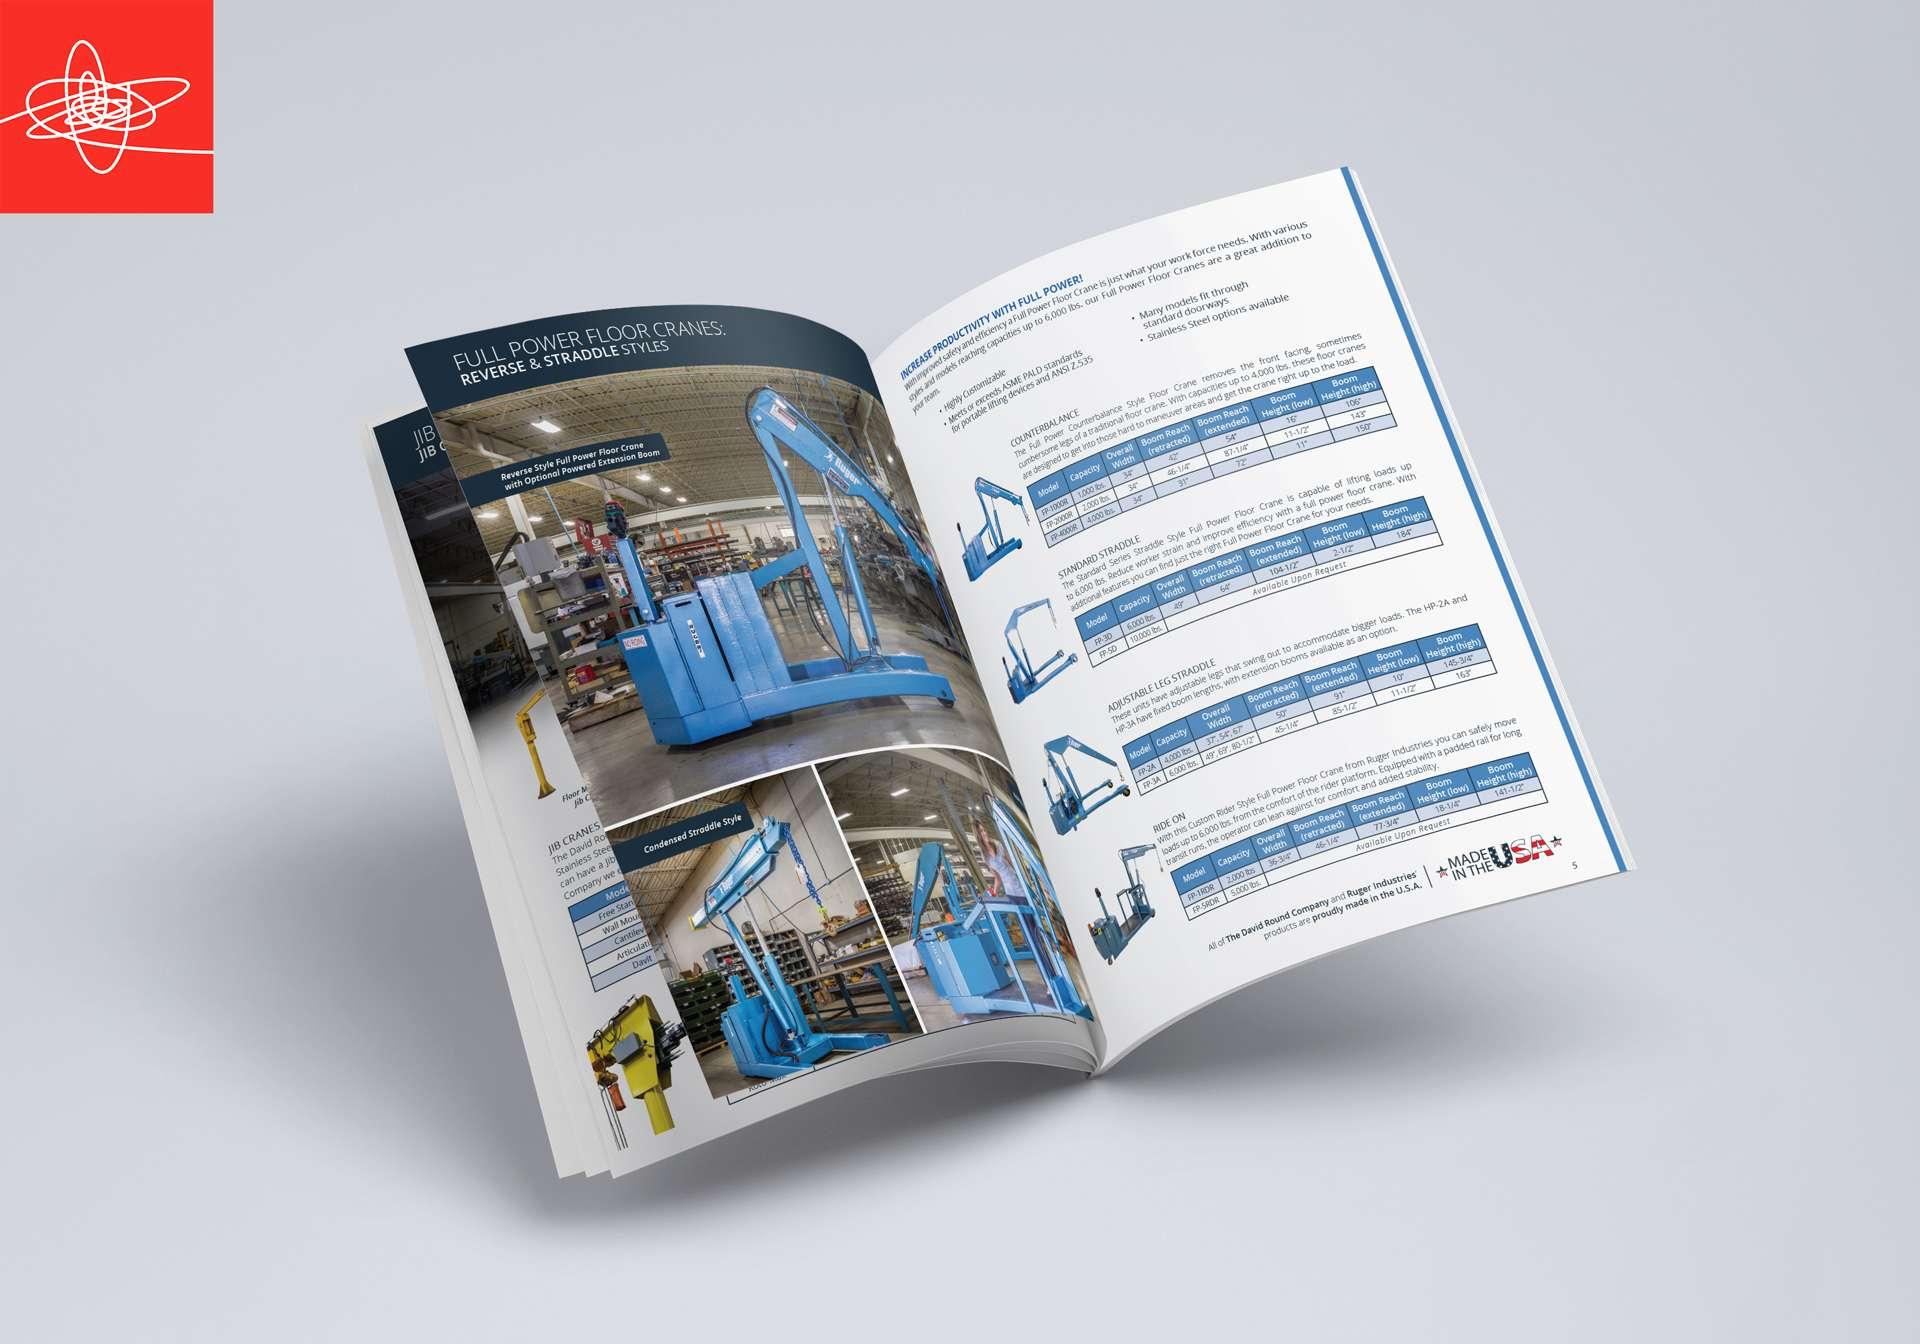 DavidRound - Catalog - On-Demand Printing